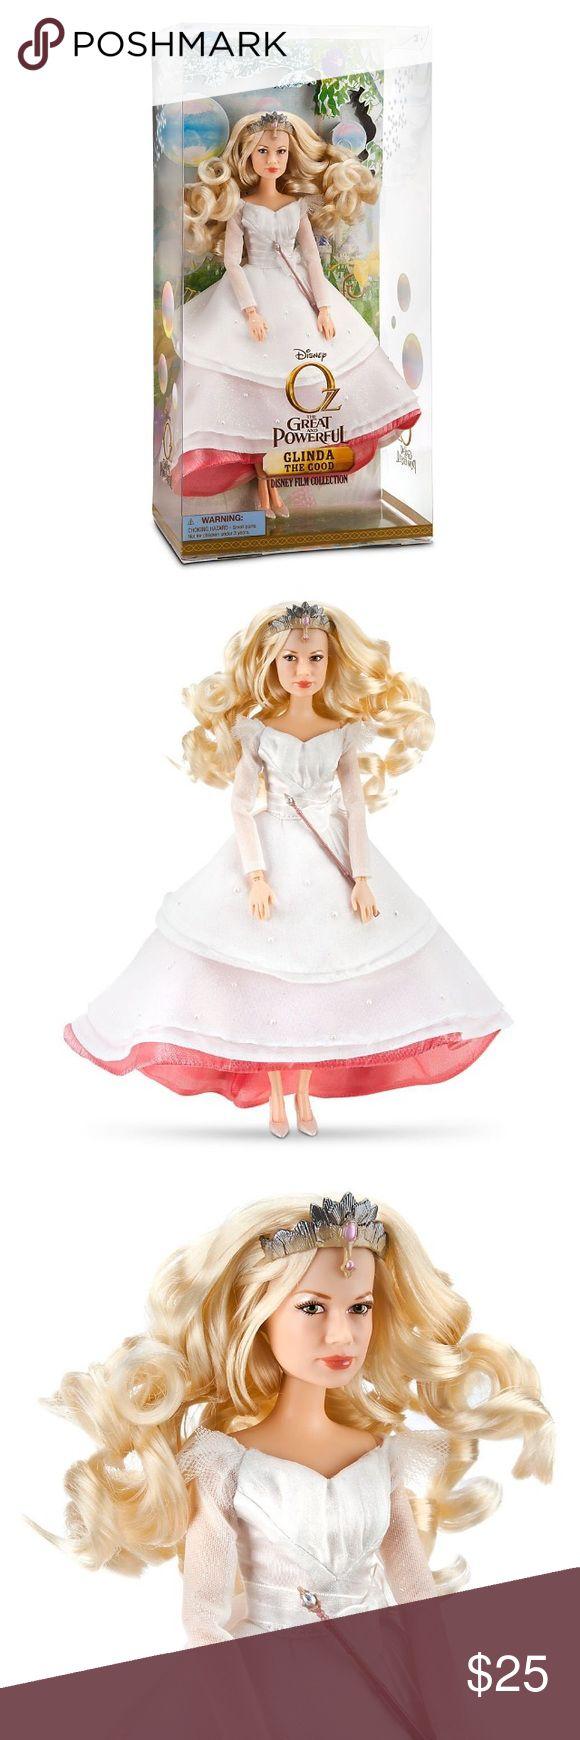 171 best Doll-Dolls I Want images on Pinterest | Barbie ...